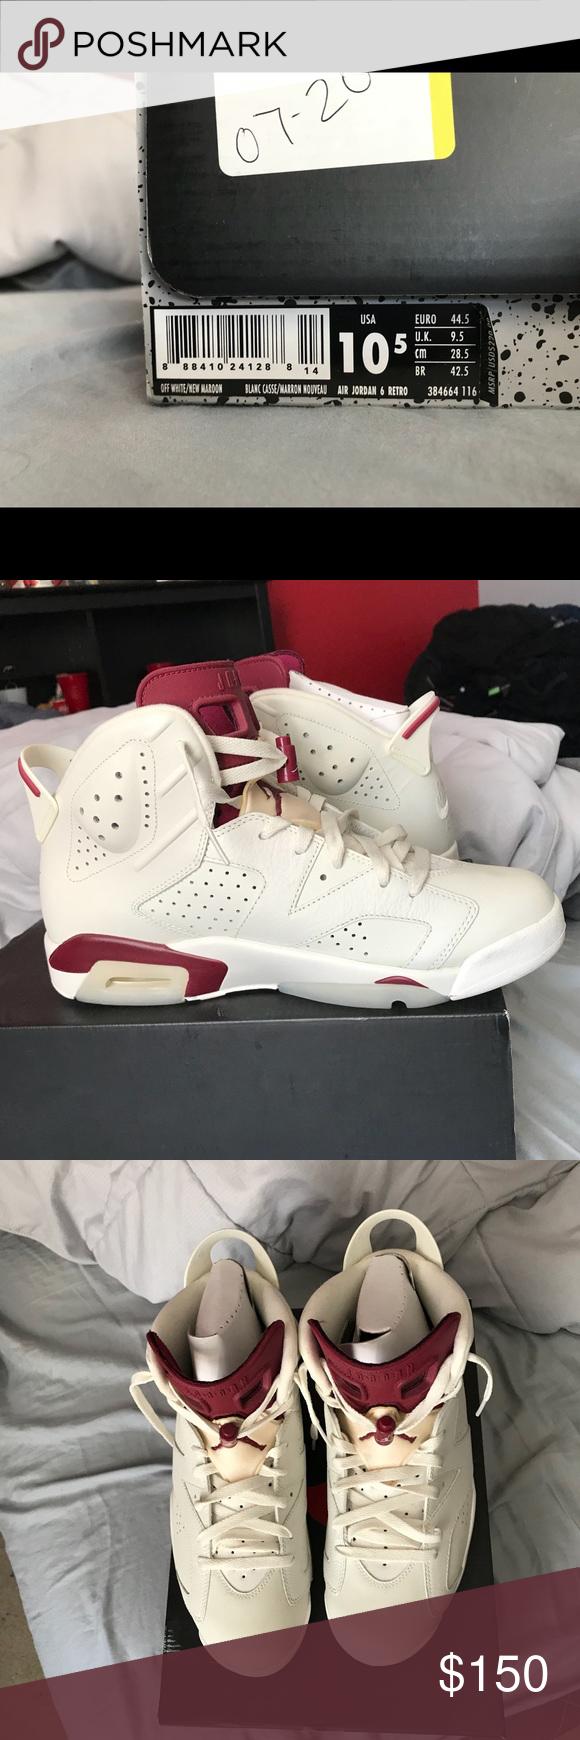 "Air Jordan 6 Retro ""Maroon"" Men's Sz 10.5 Men's Size 10.5"